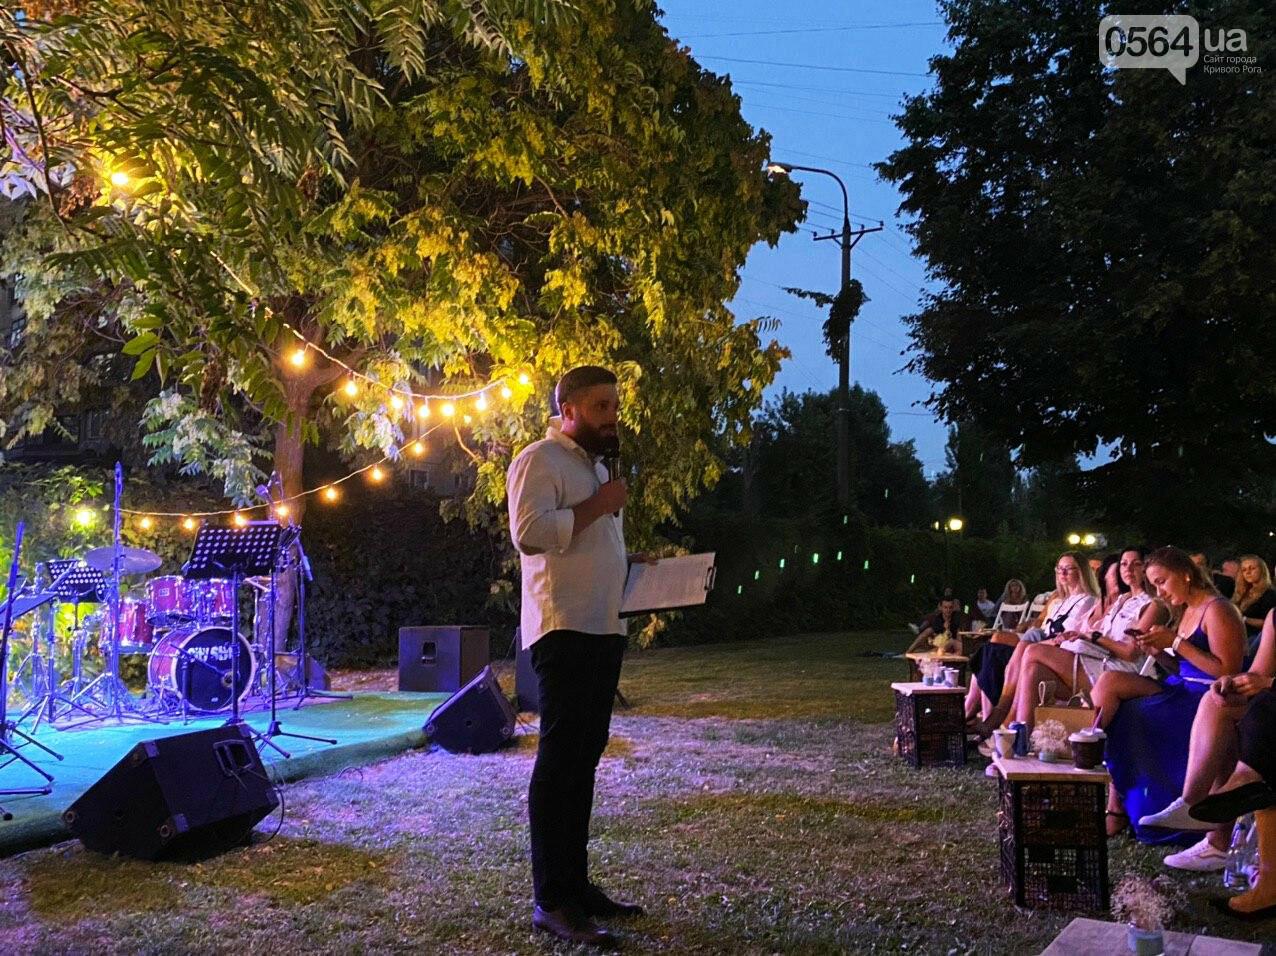 Под звездным небом криворожане наслаждались летним джазом от  Advantage Project, - ФОТО, ВИДЕО , фото-56